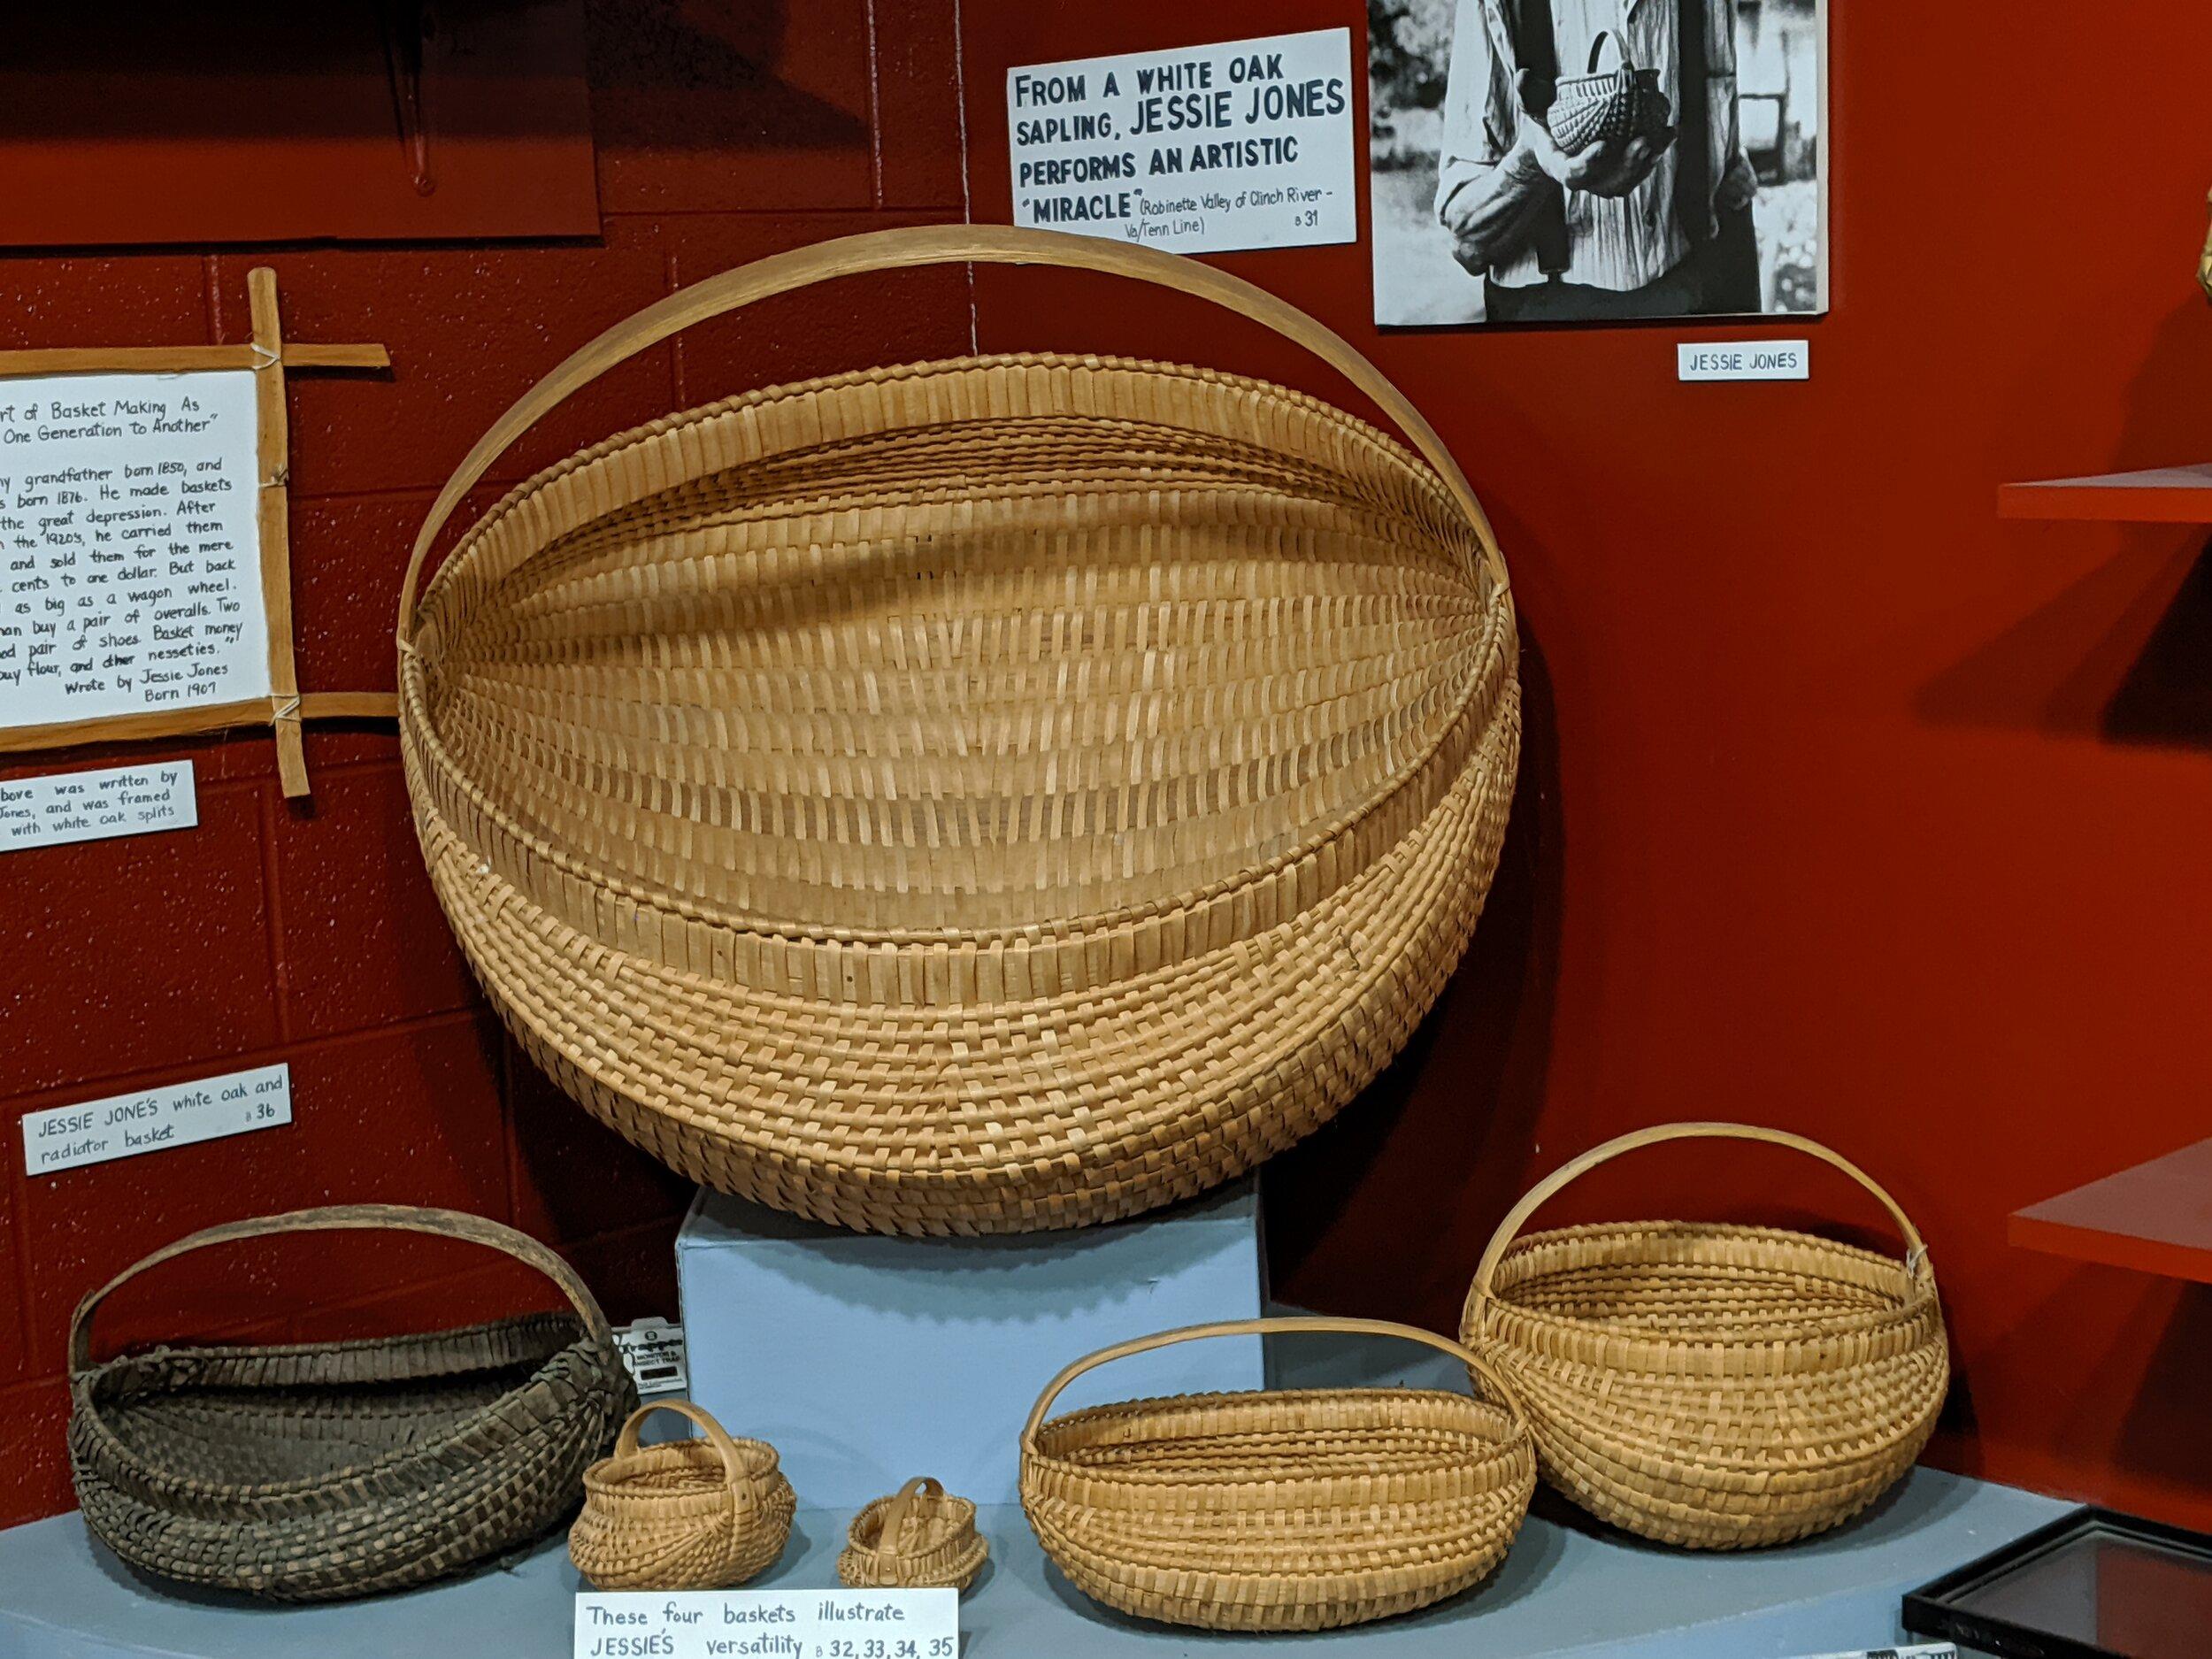 Some expert basketwork.